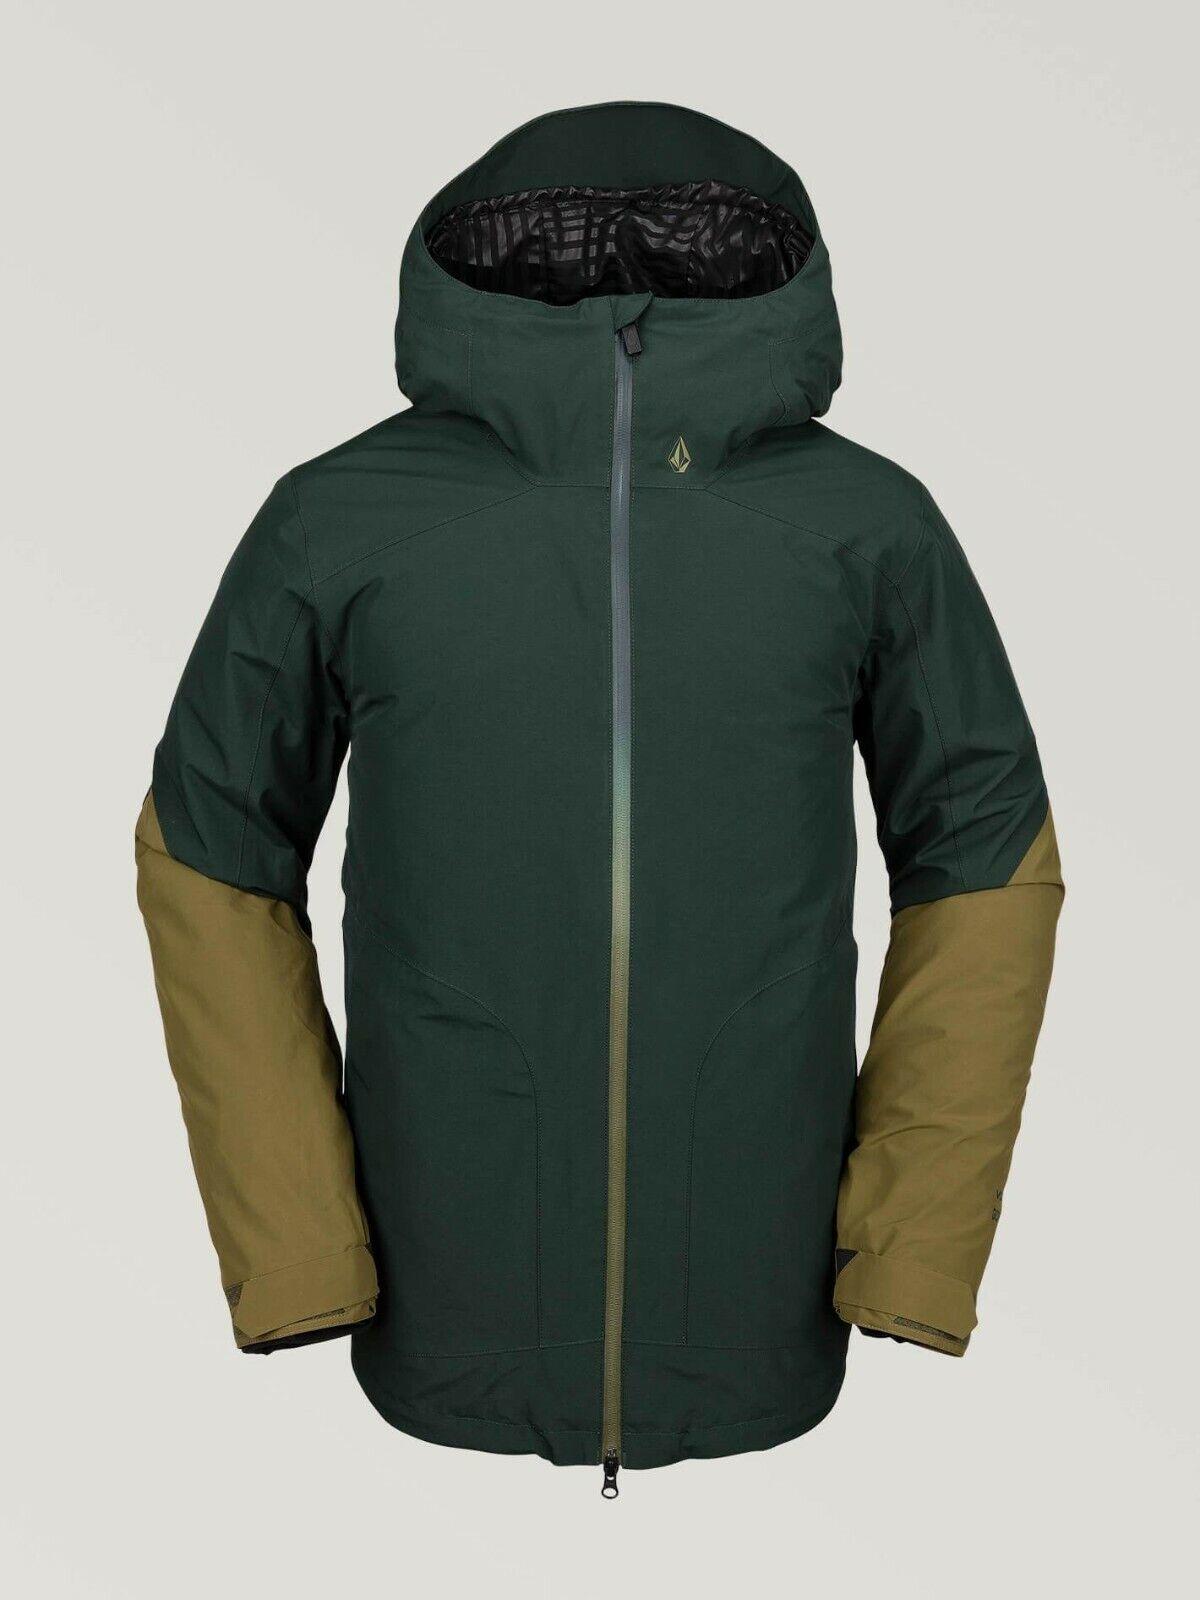 2020 NWT MENS VOLCOM RESIN GORE-TEX SNOWBOARD JACKET  340 L Dark Grün